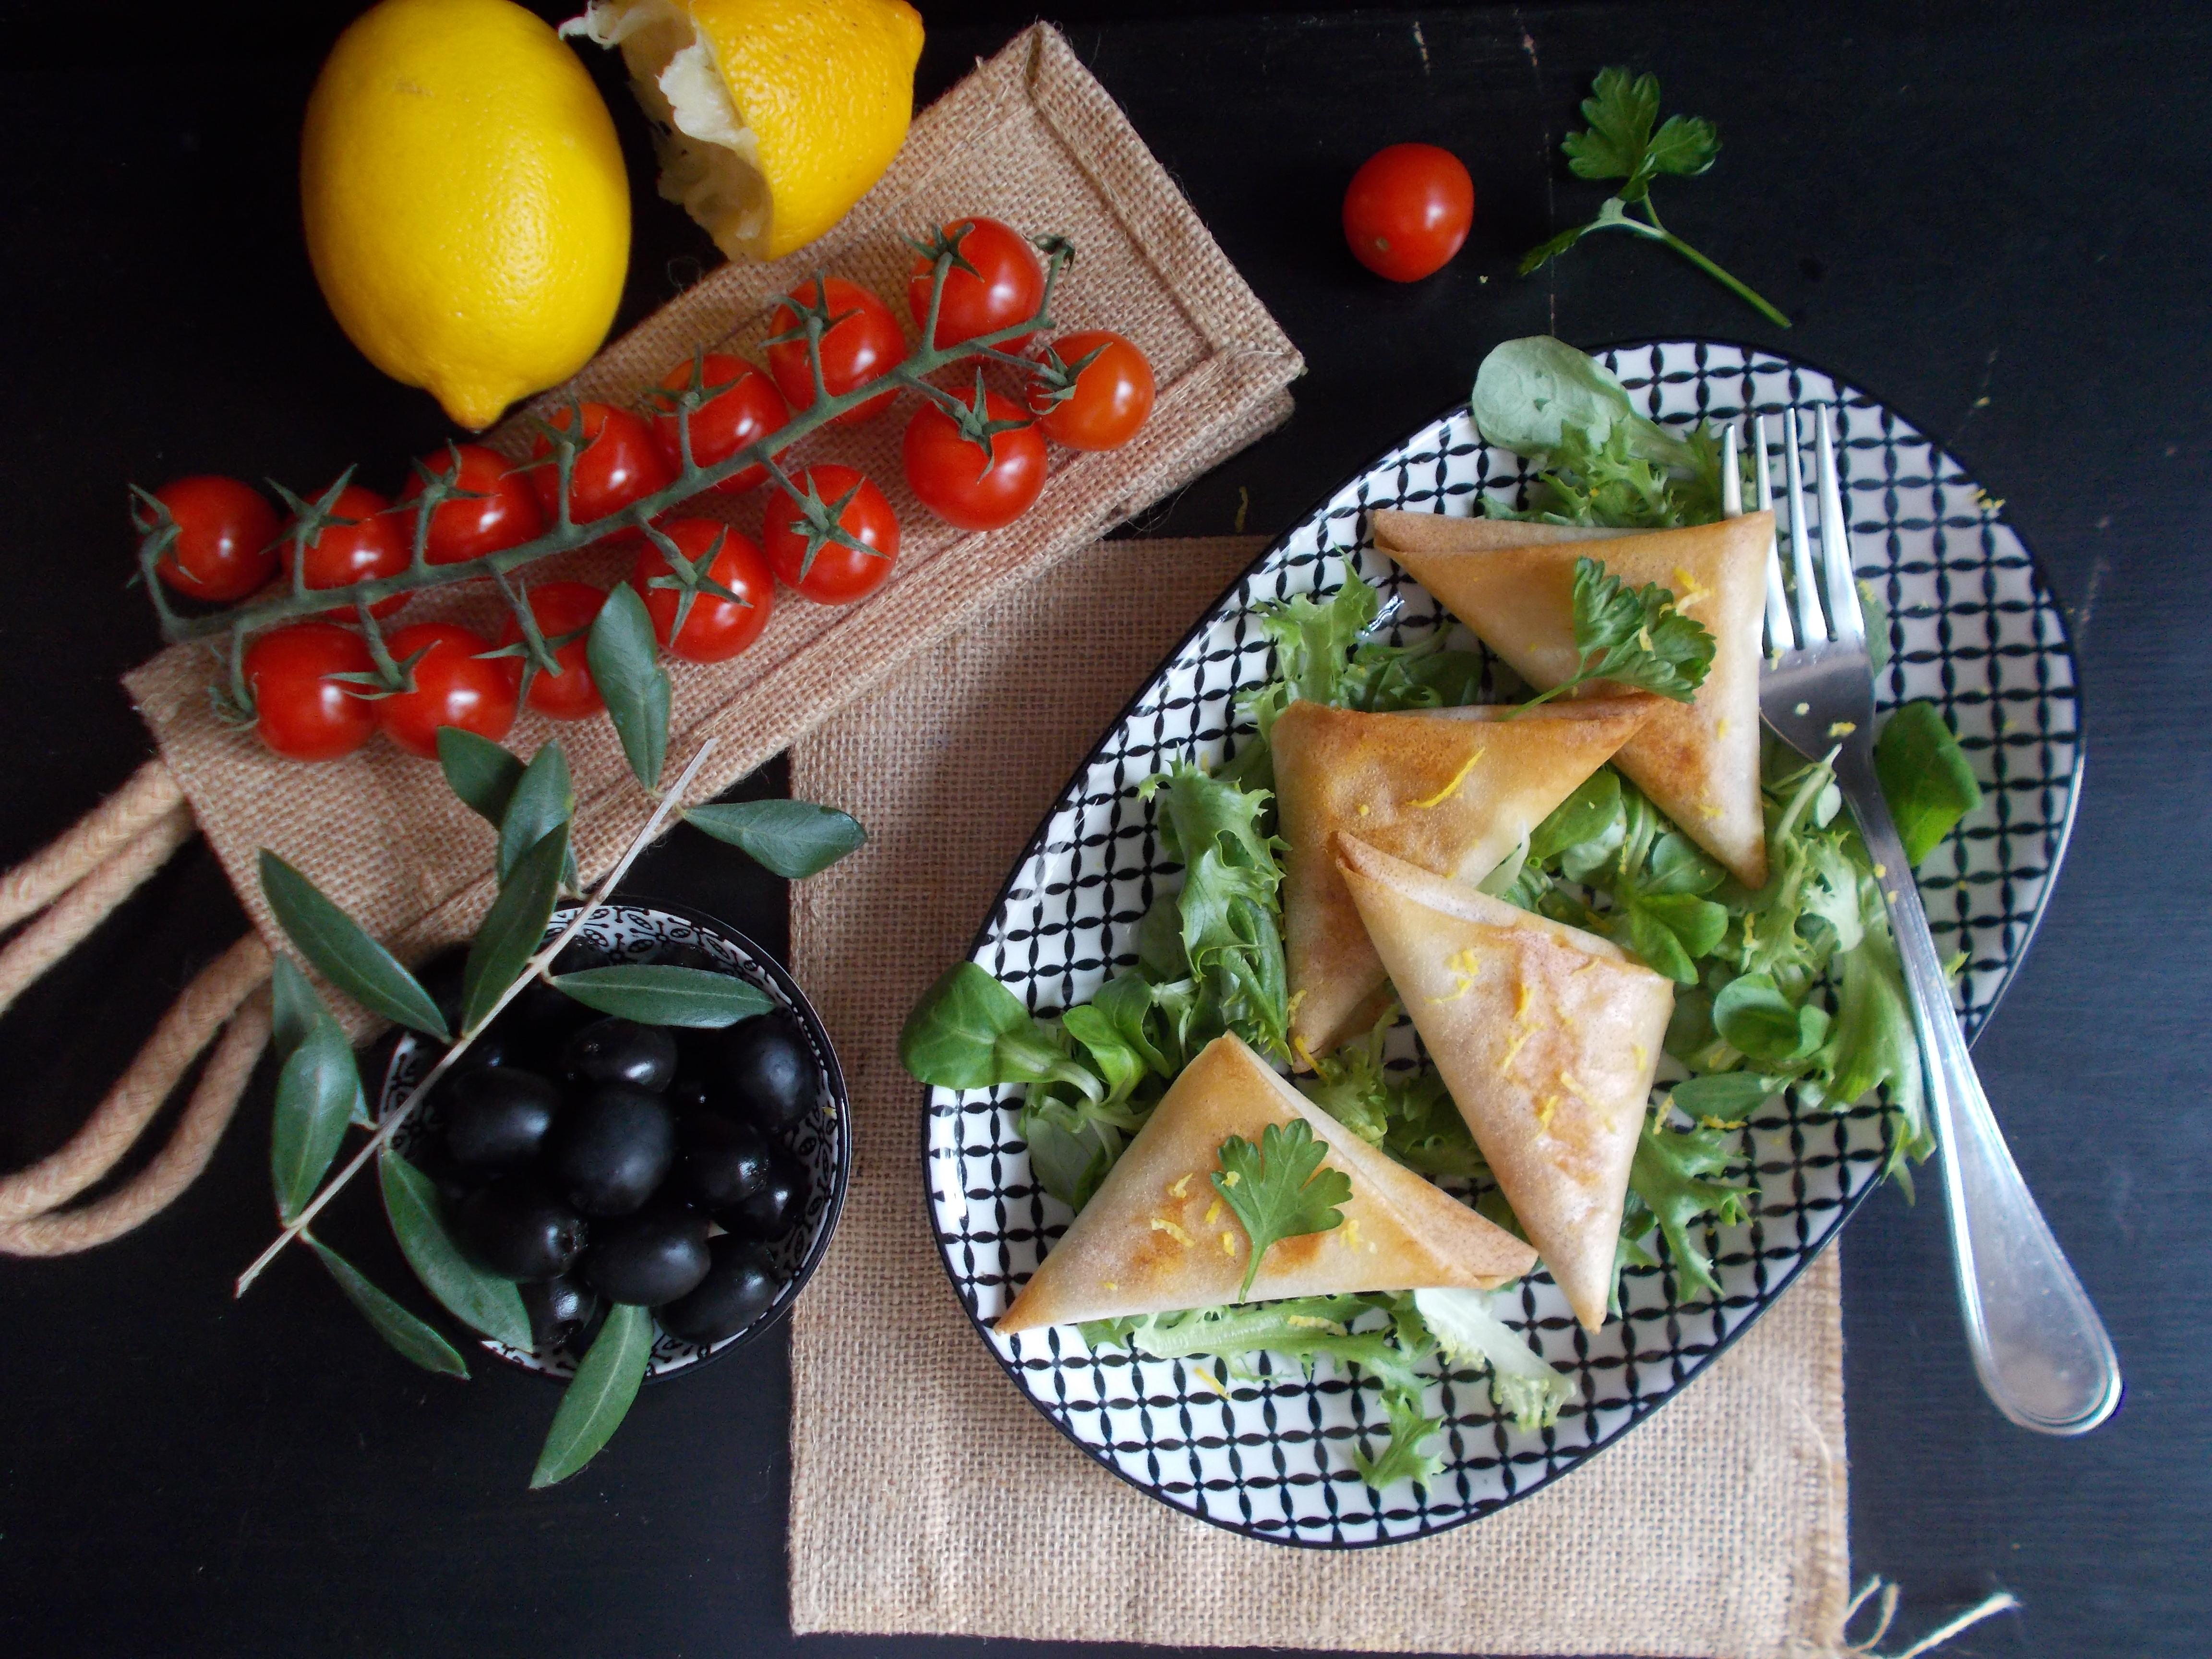 Samossas poulet, citron, olive